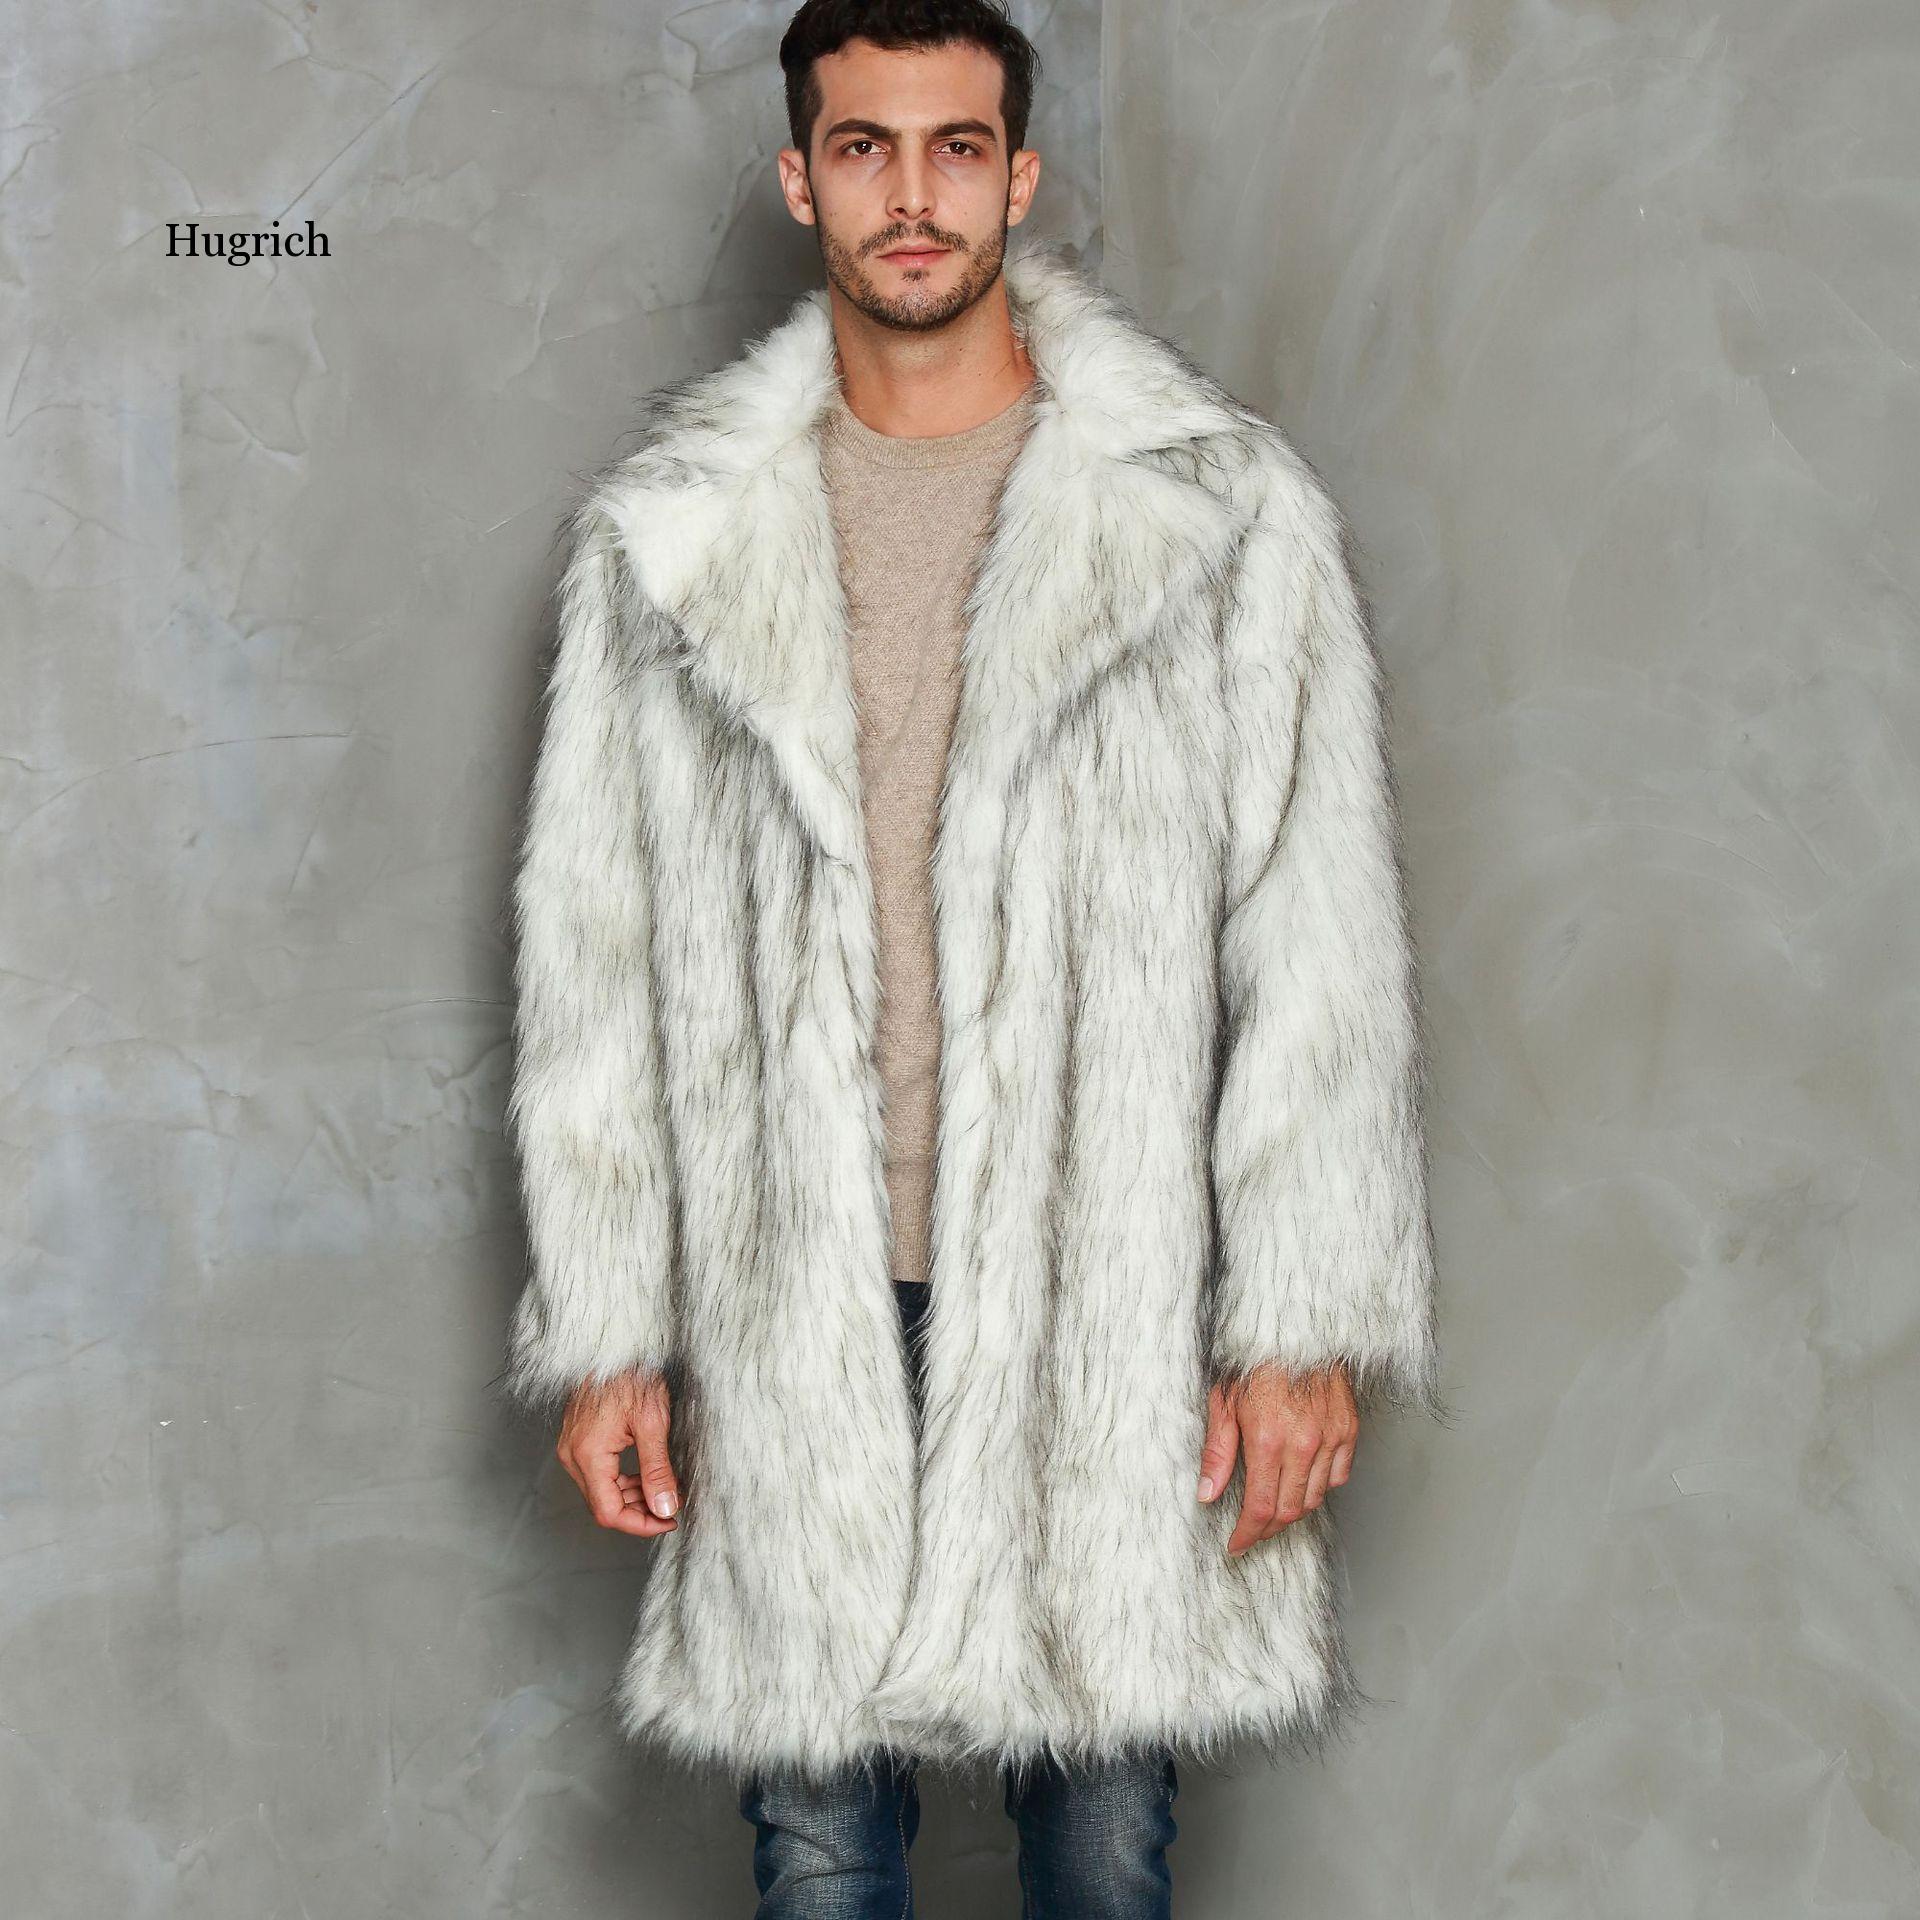 Winter Men Faux Fur Coat 2020 Fox Jacket Fashion Mens Warm Solid Color Thick Outwear Overcoat